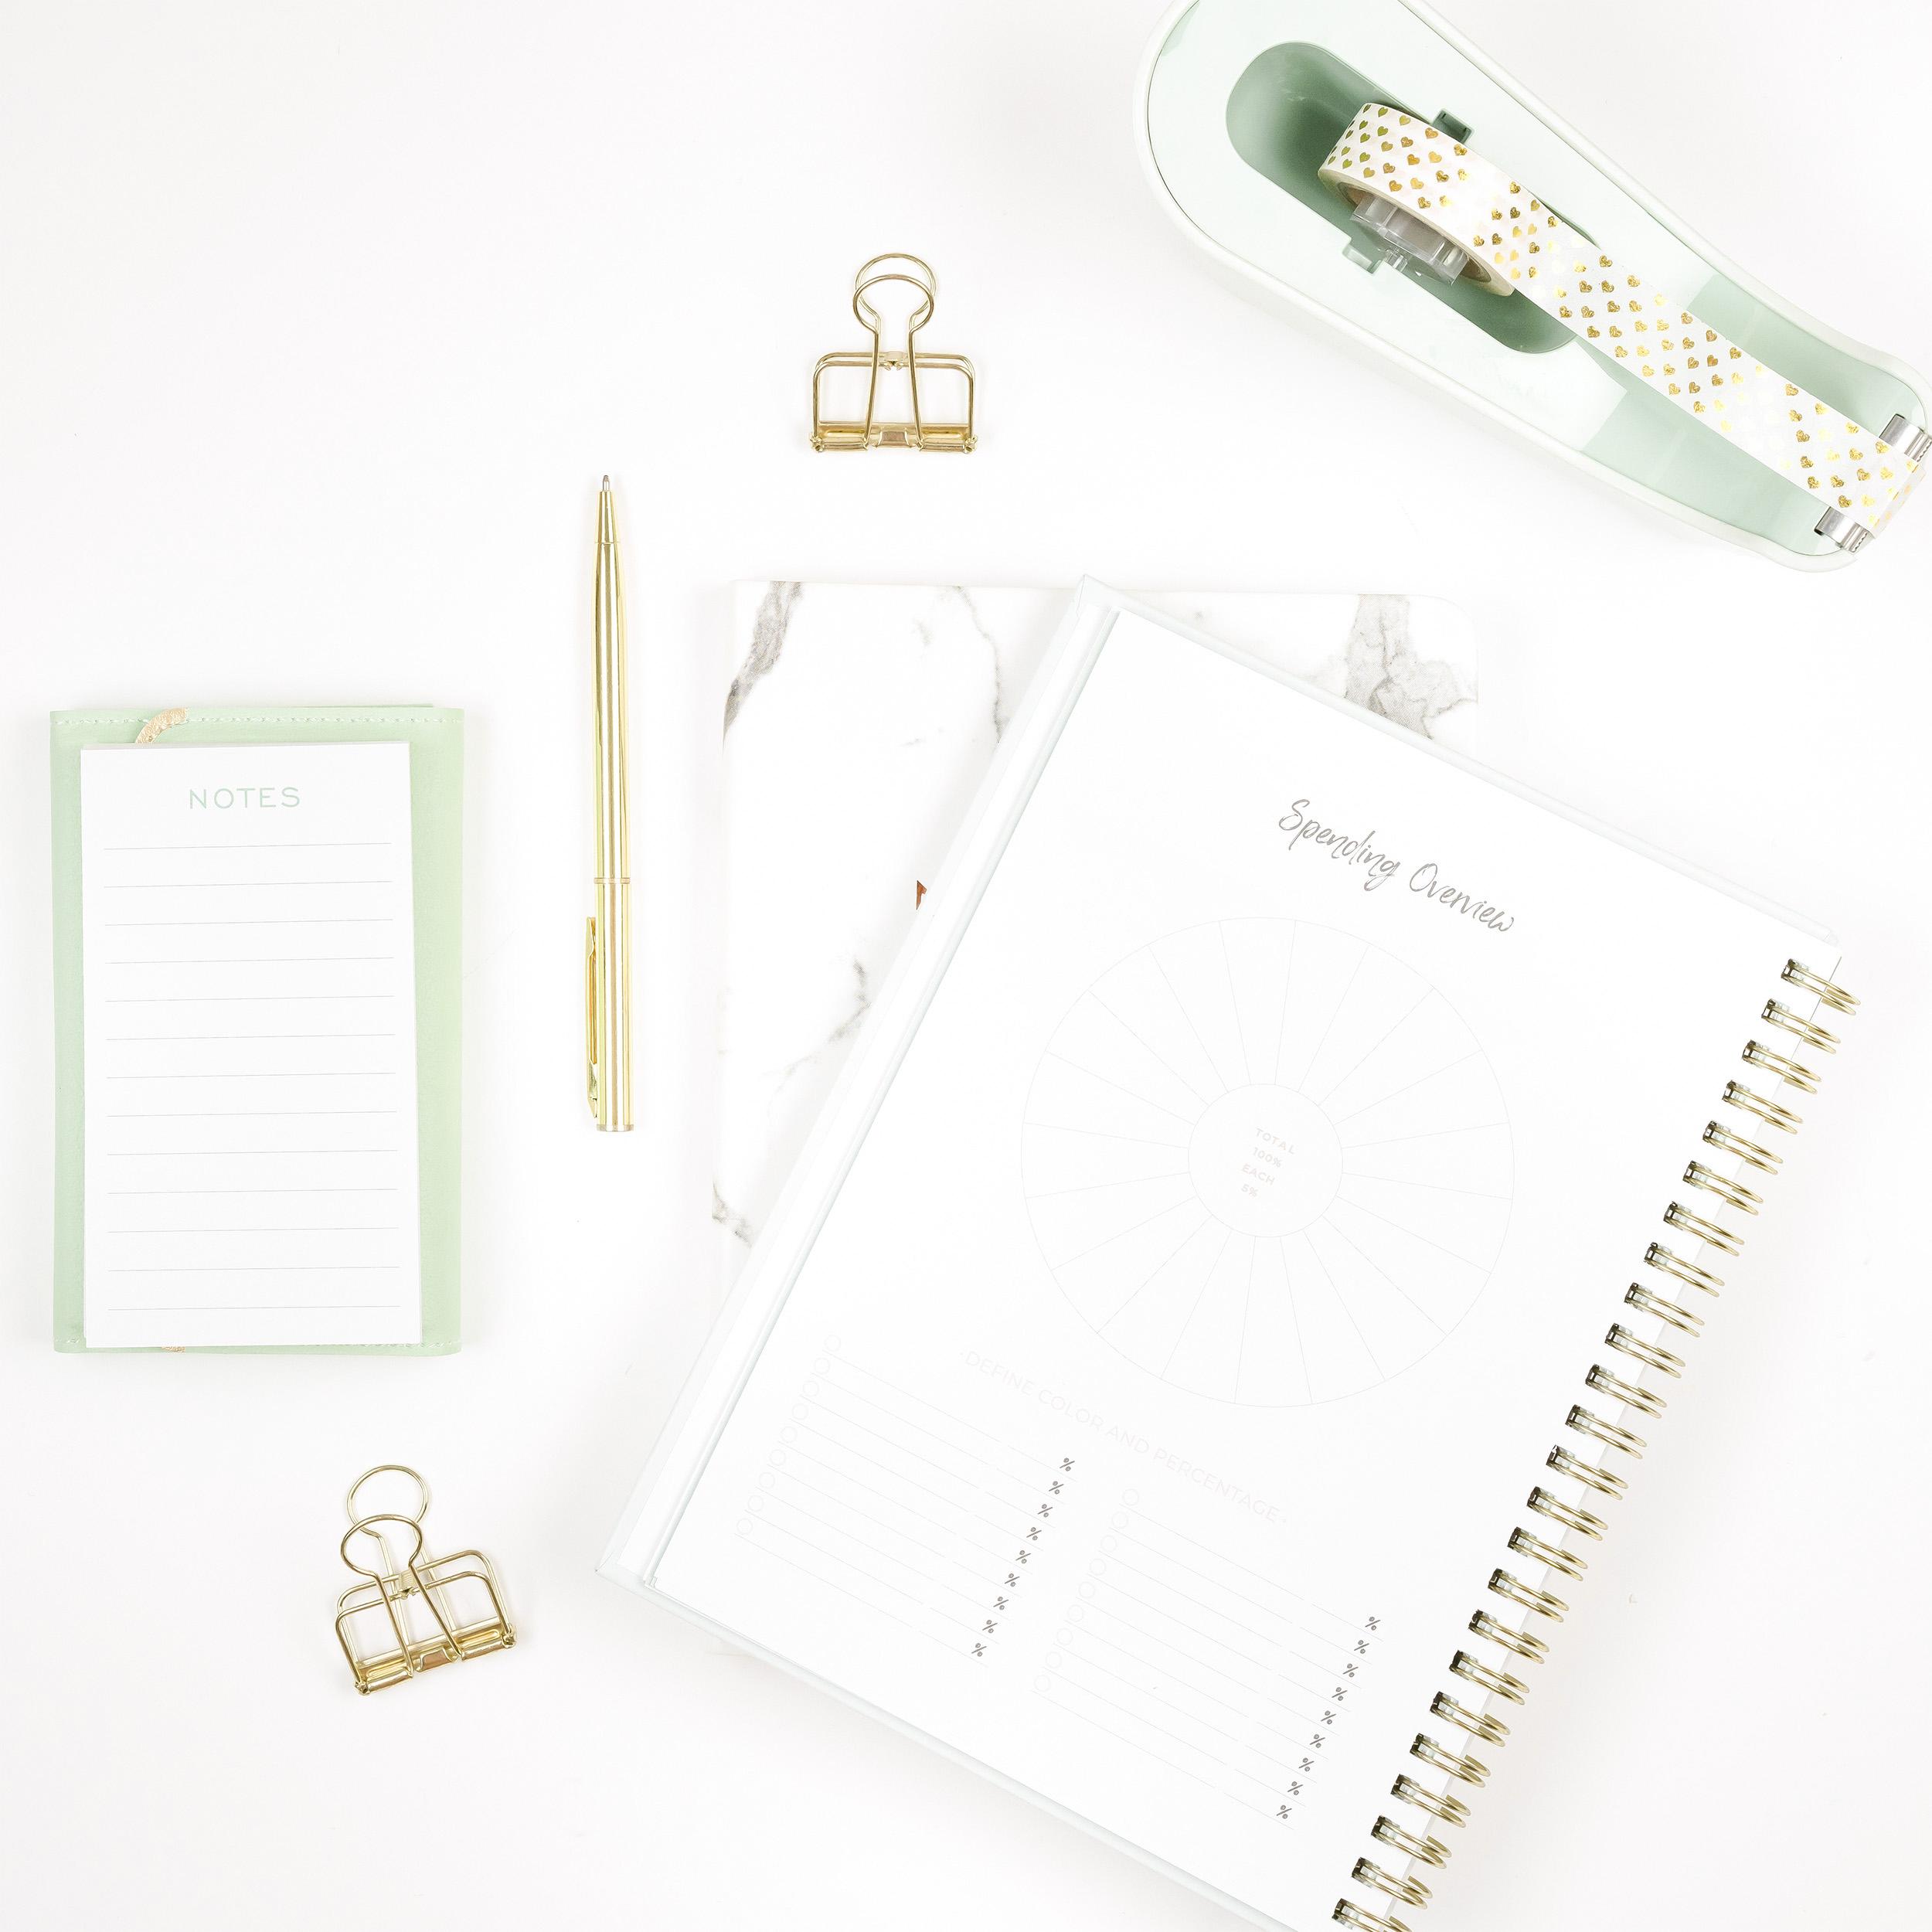 get organized with a preparing for divorce checklist